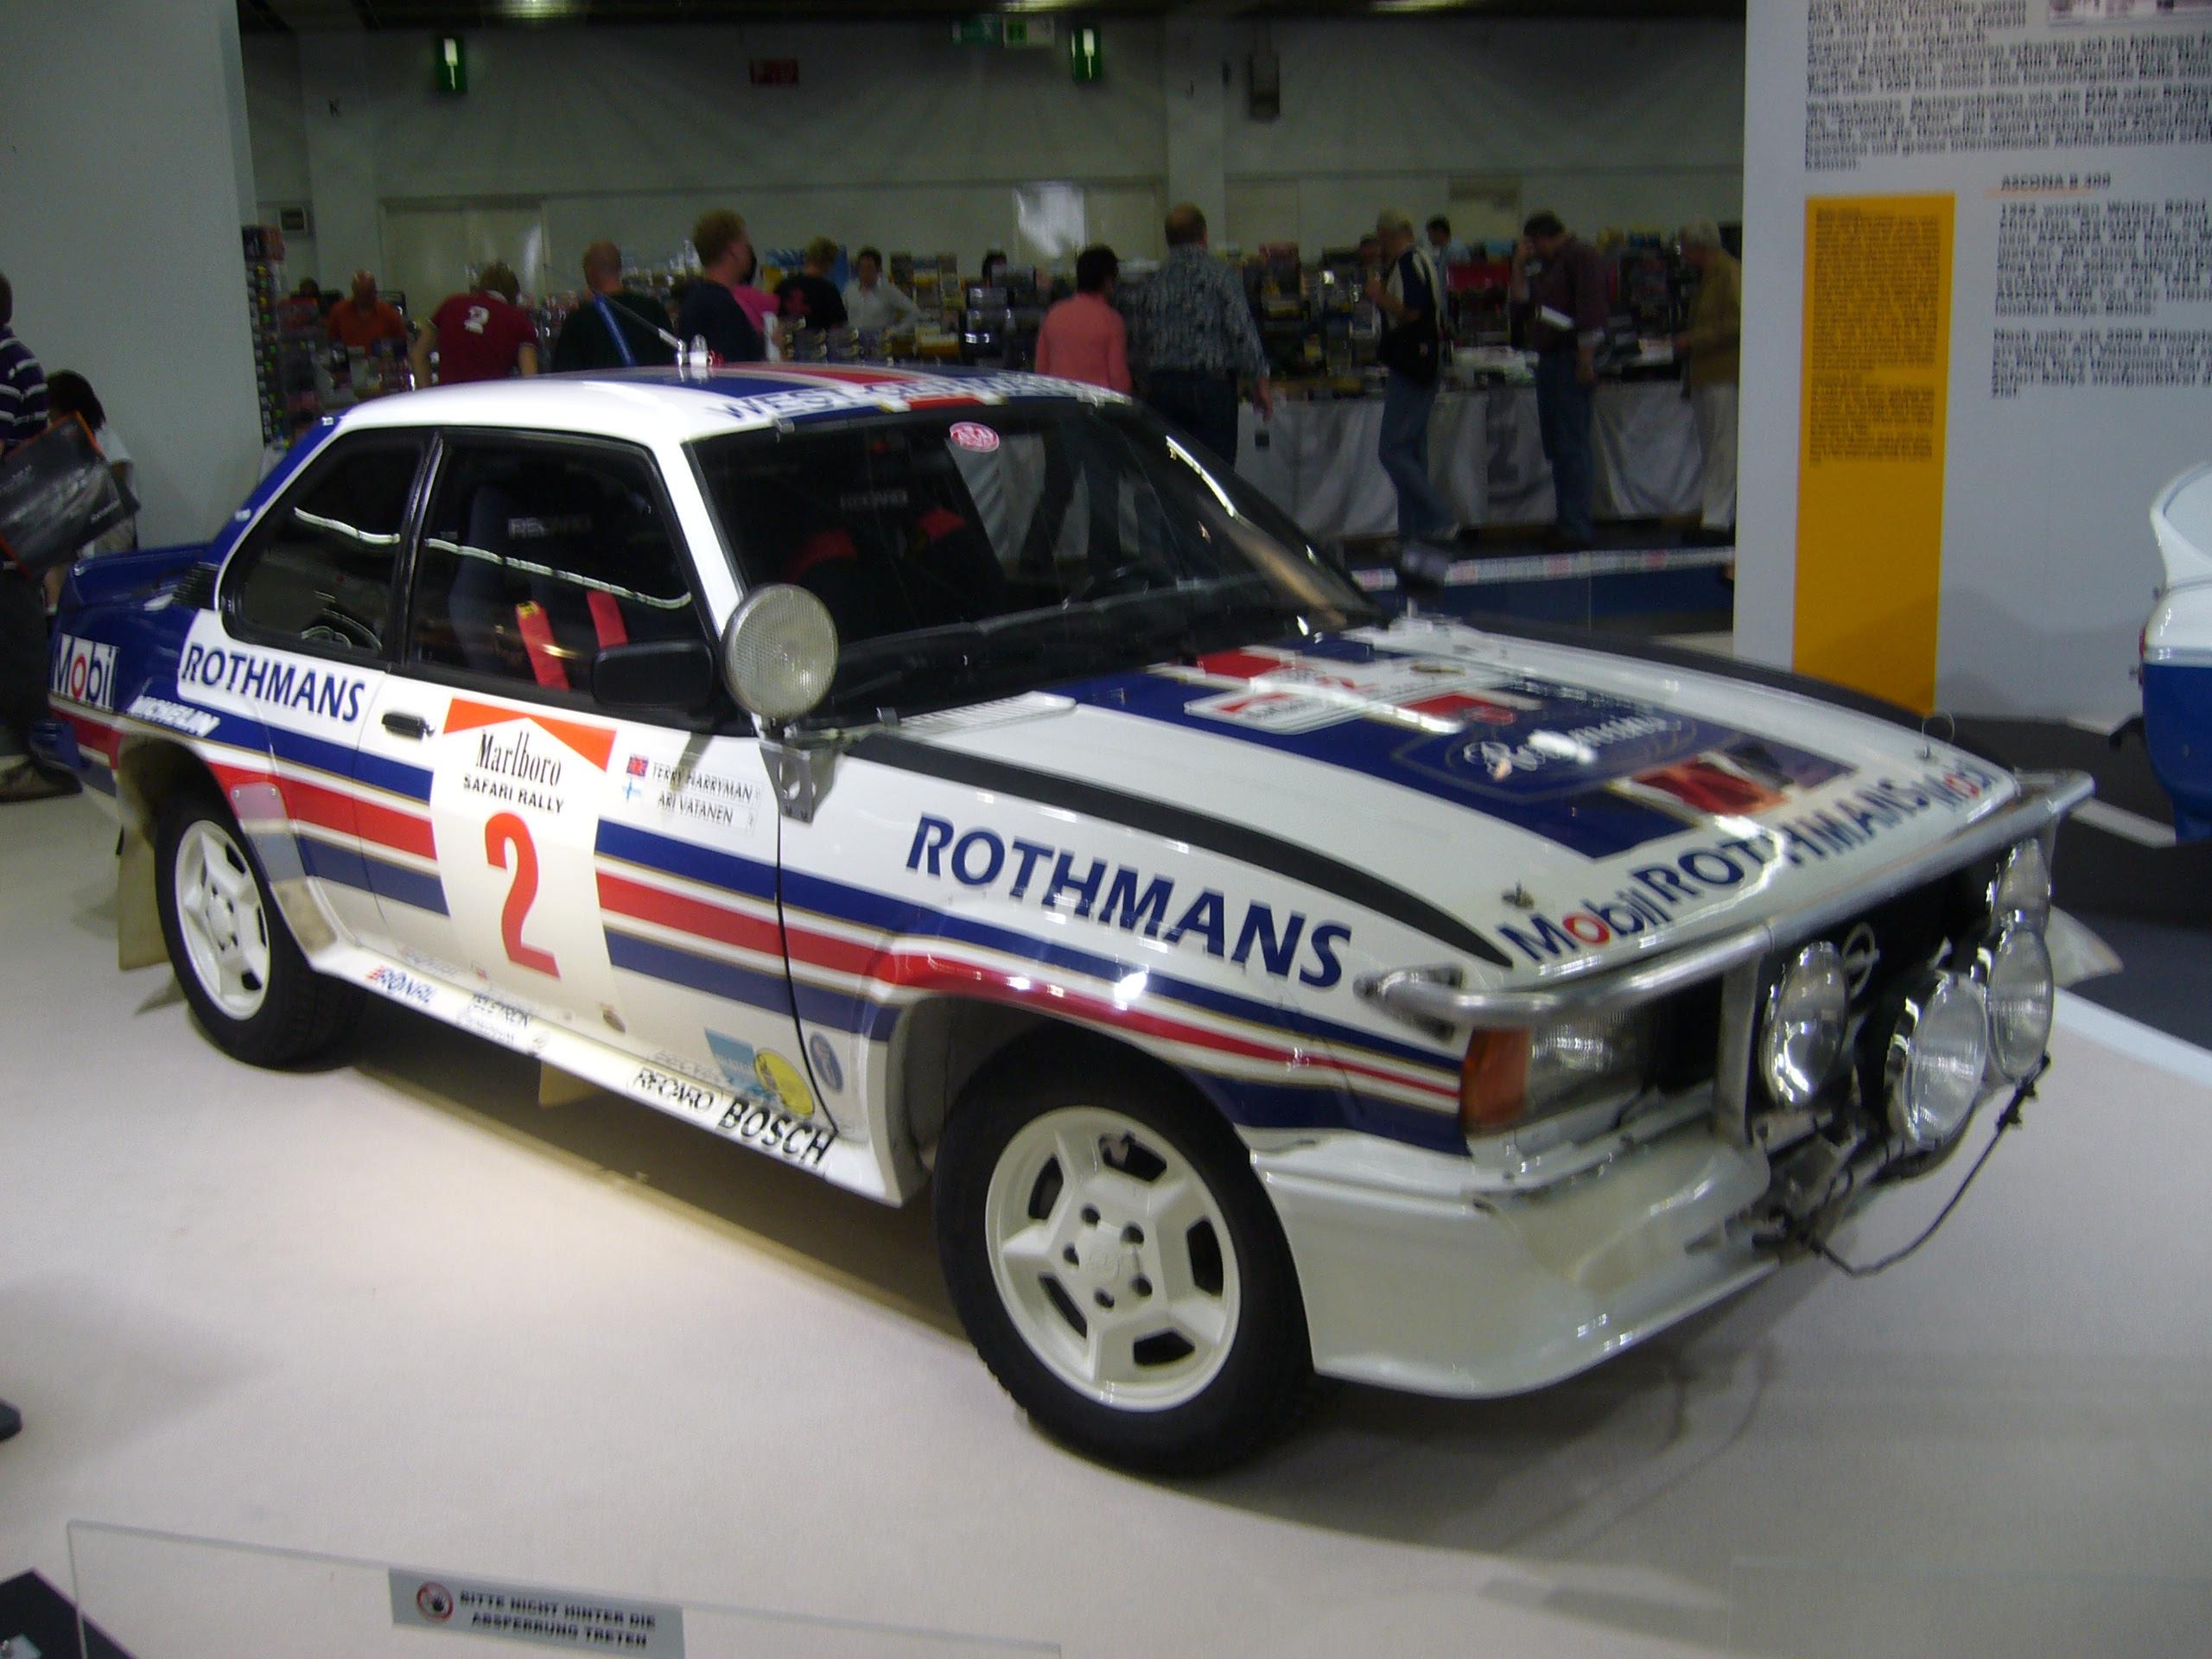 http://upload.wikimedia.org/wikipedia/commons/1/15/Opel_Ascona_Rallye_Rothmans.JPG